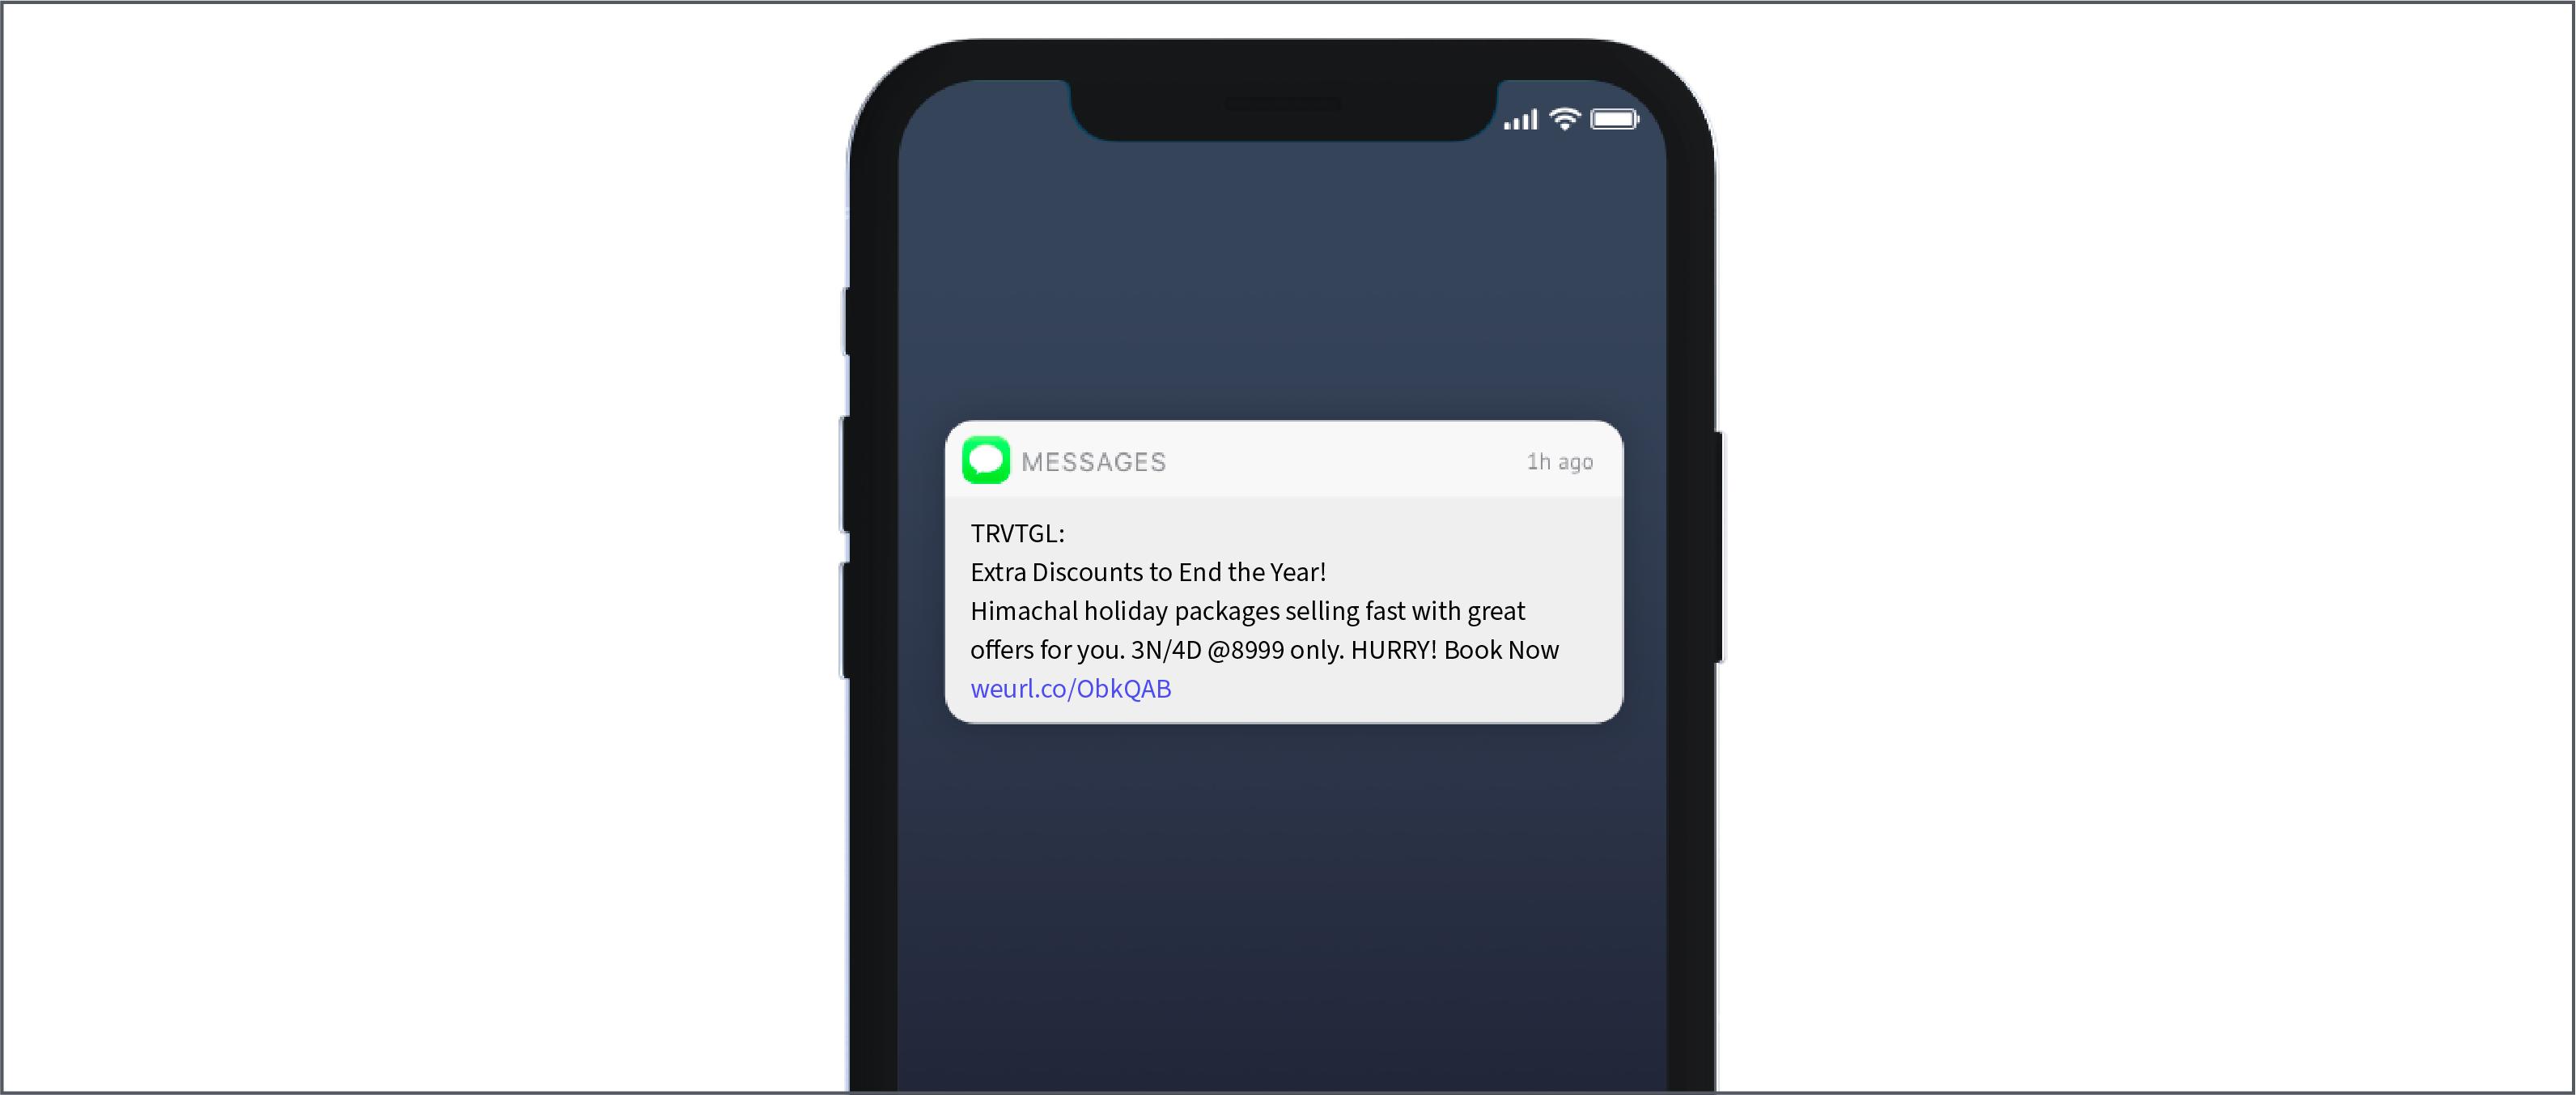 Traveltriangle SMS